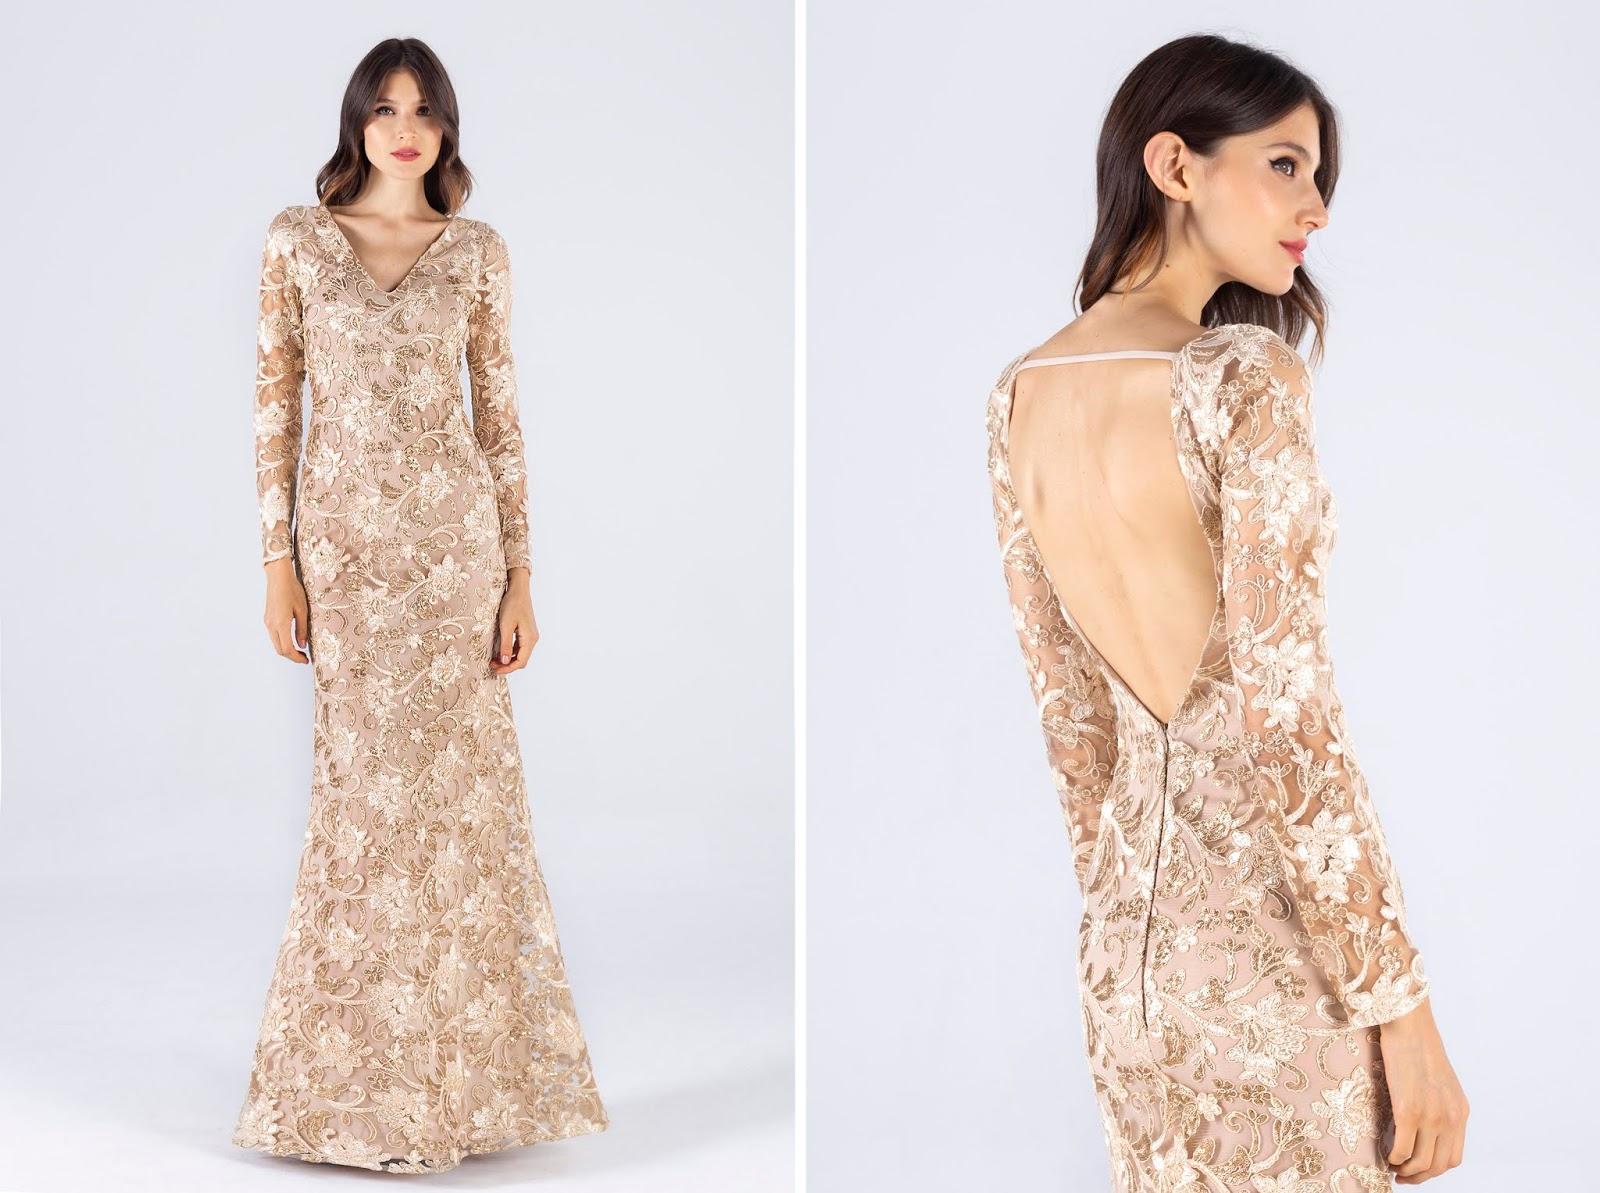 Moda vestidos verano 2020. Moda verano 2020.